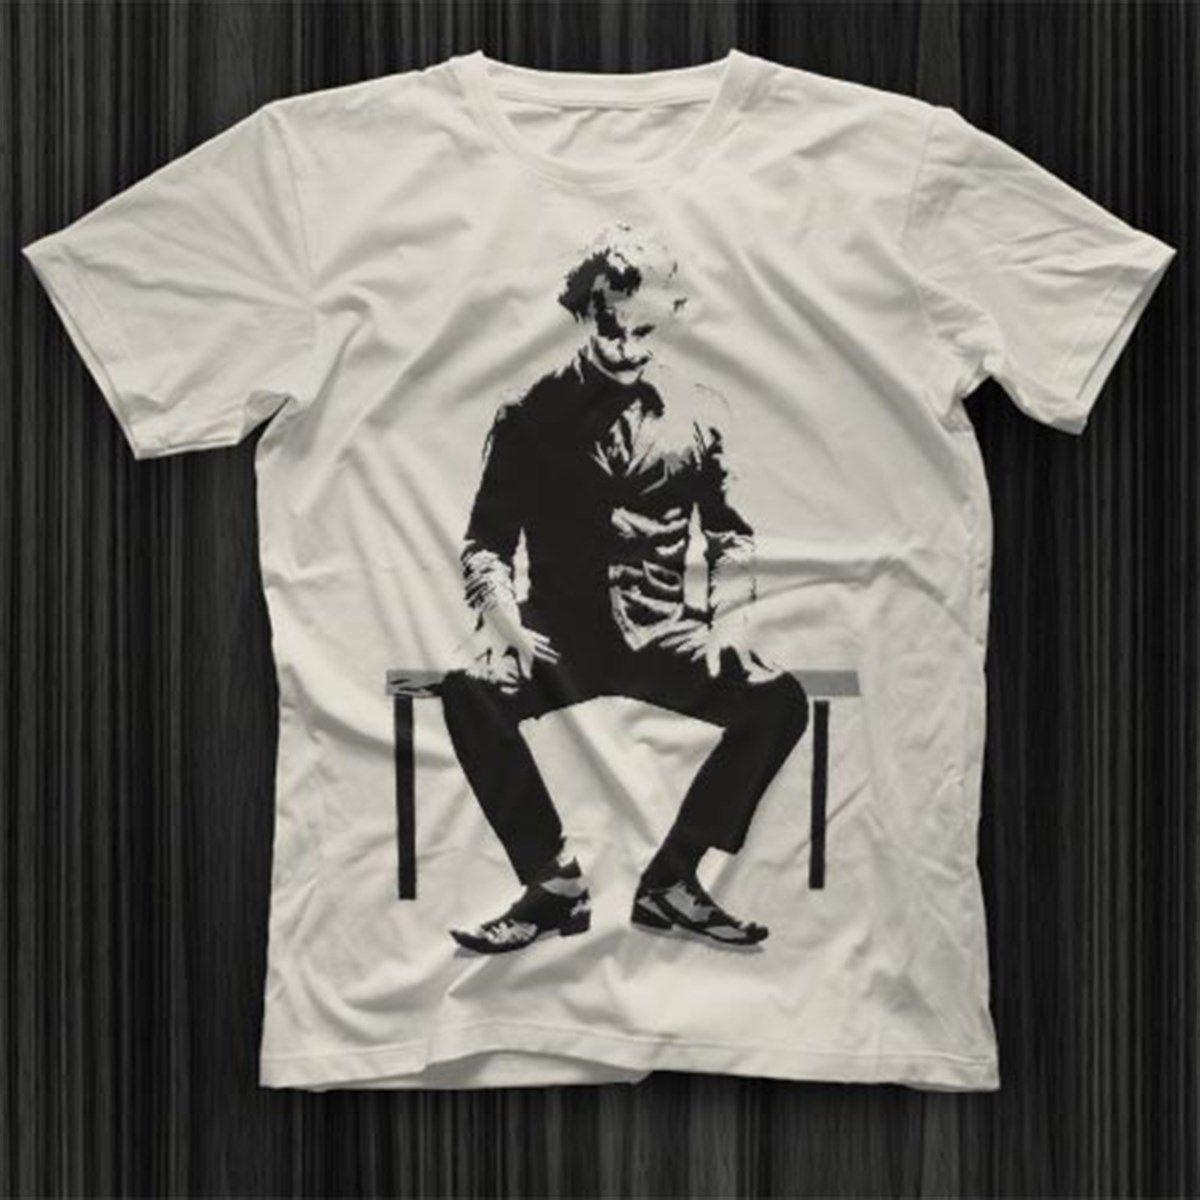 Joker Unisex S Shirts